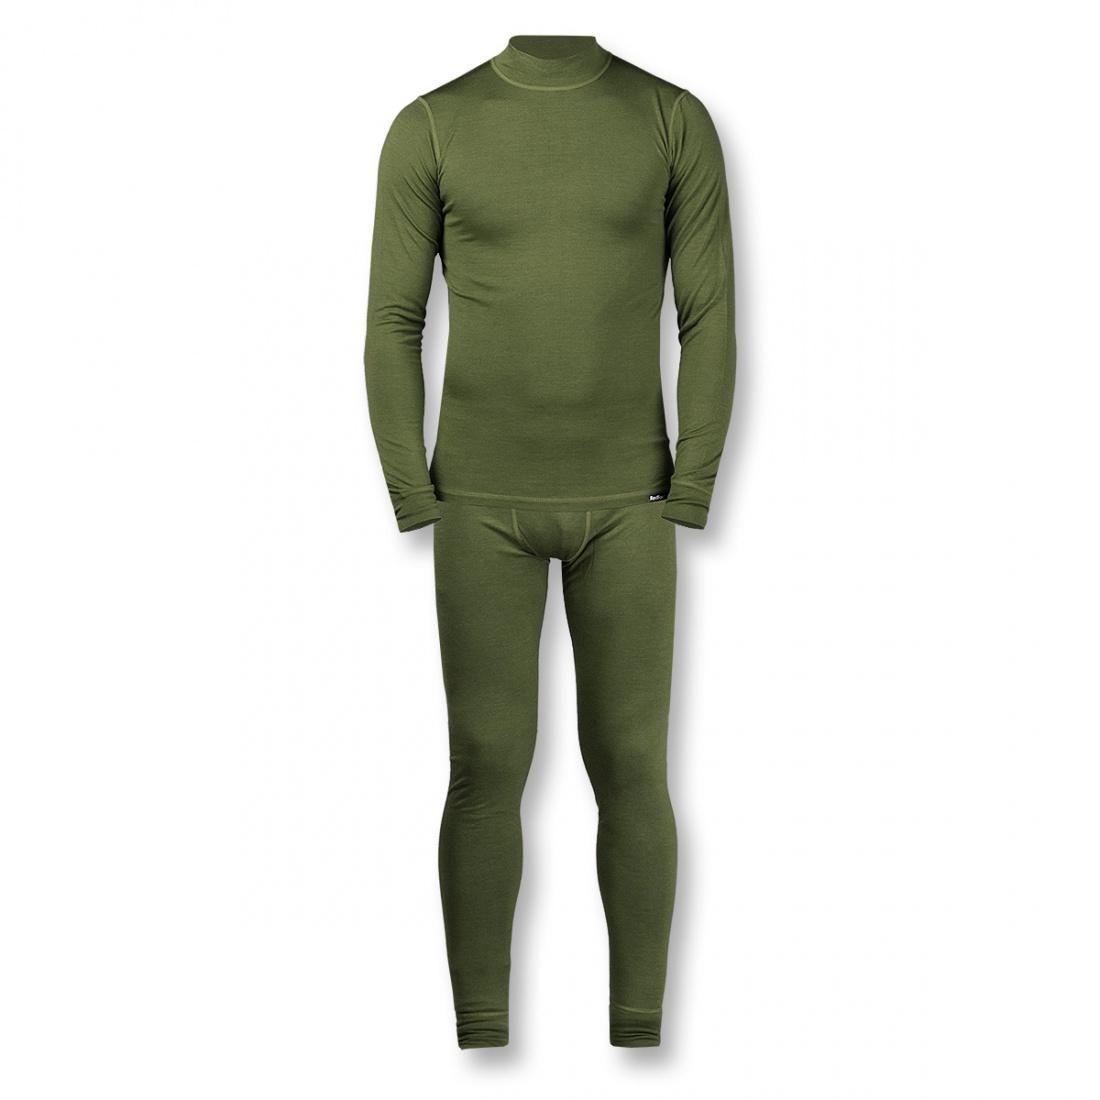 Термобелье костюм Wool Dry Light МужскойКомплекты<br><br><br>Цвет: Зеленый<br>Размер: 60